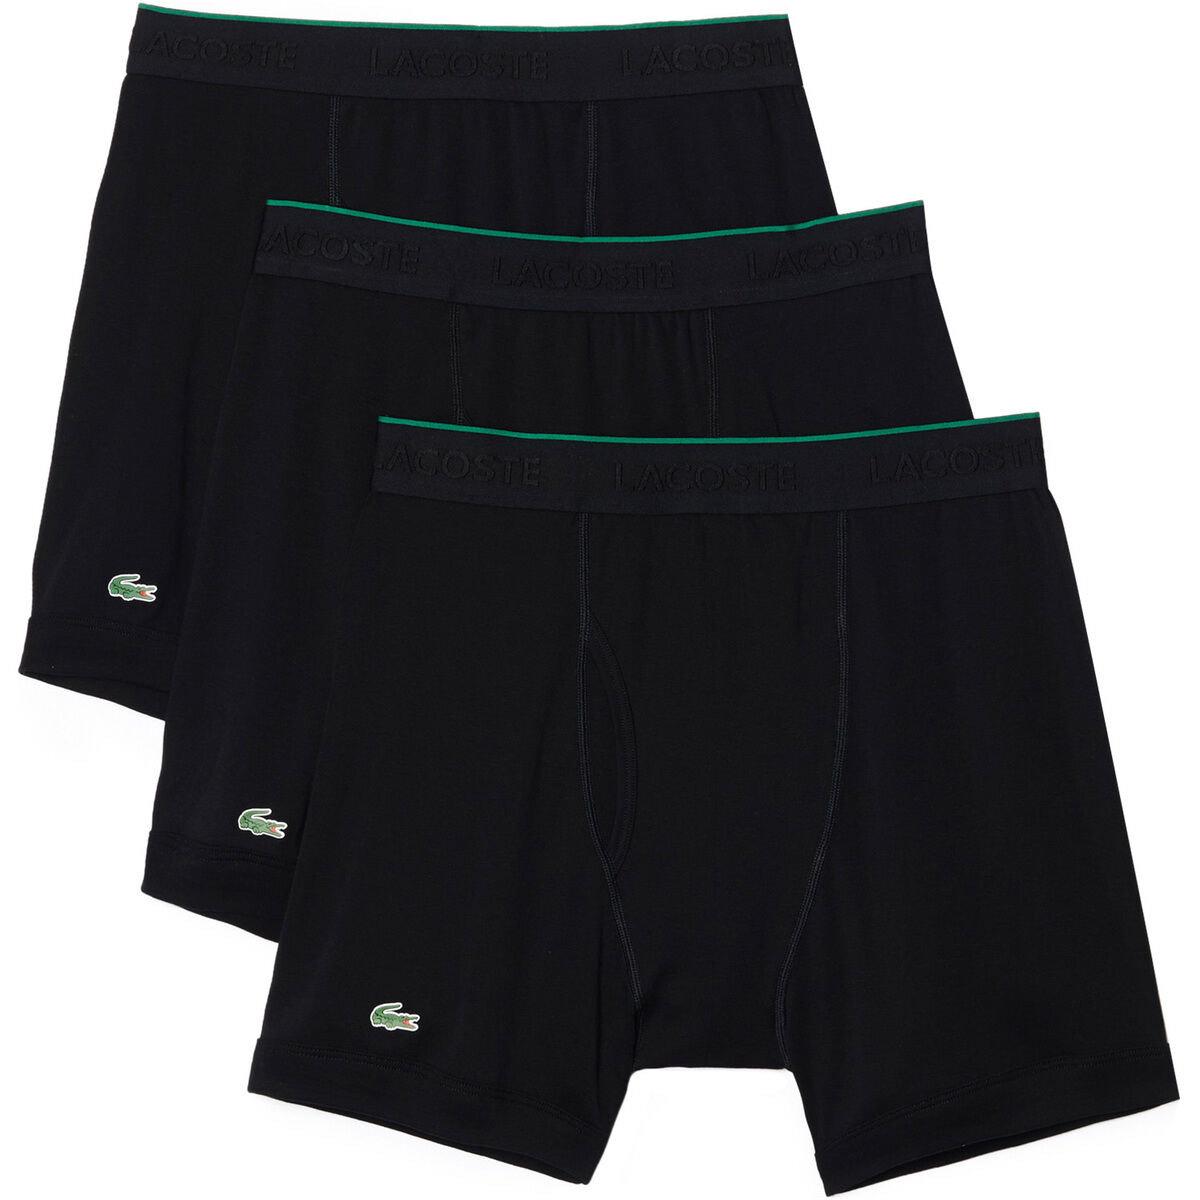 6 x Lacoste Essentials Pants Unterhosen [5,33 € pro Stück]